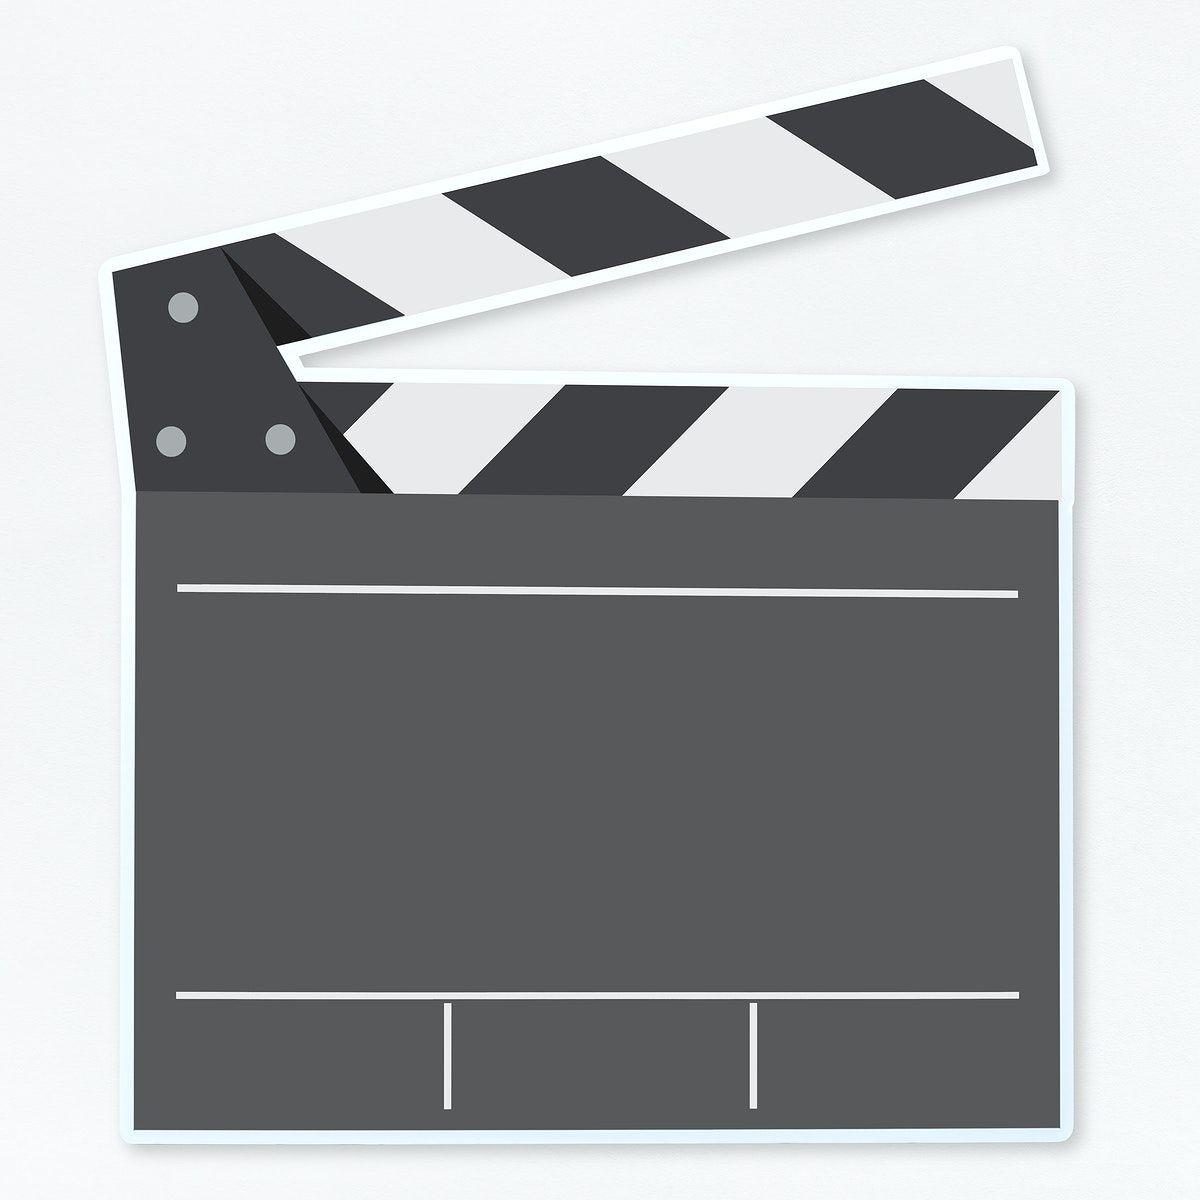 Download Premium Psd Of Film Clapper Board Illustration Illustration 475855 Camera Icon Illustration Film